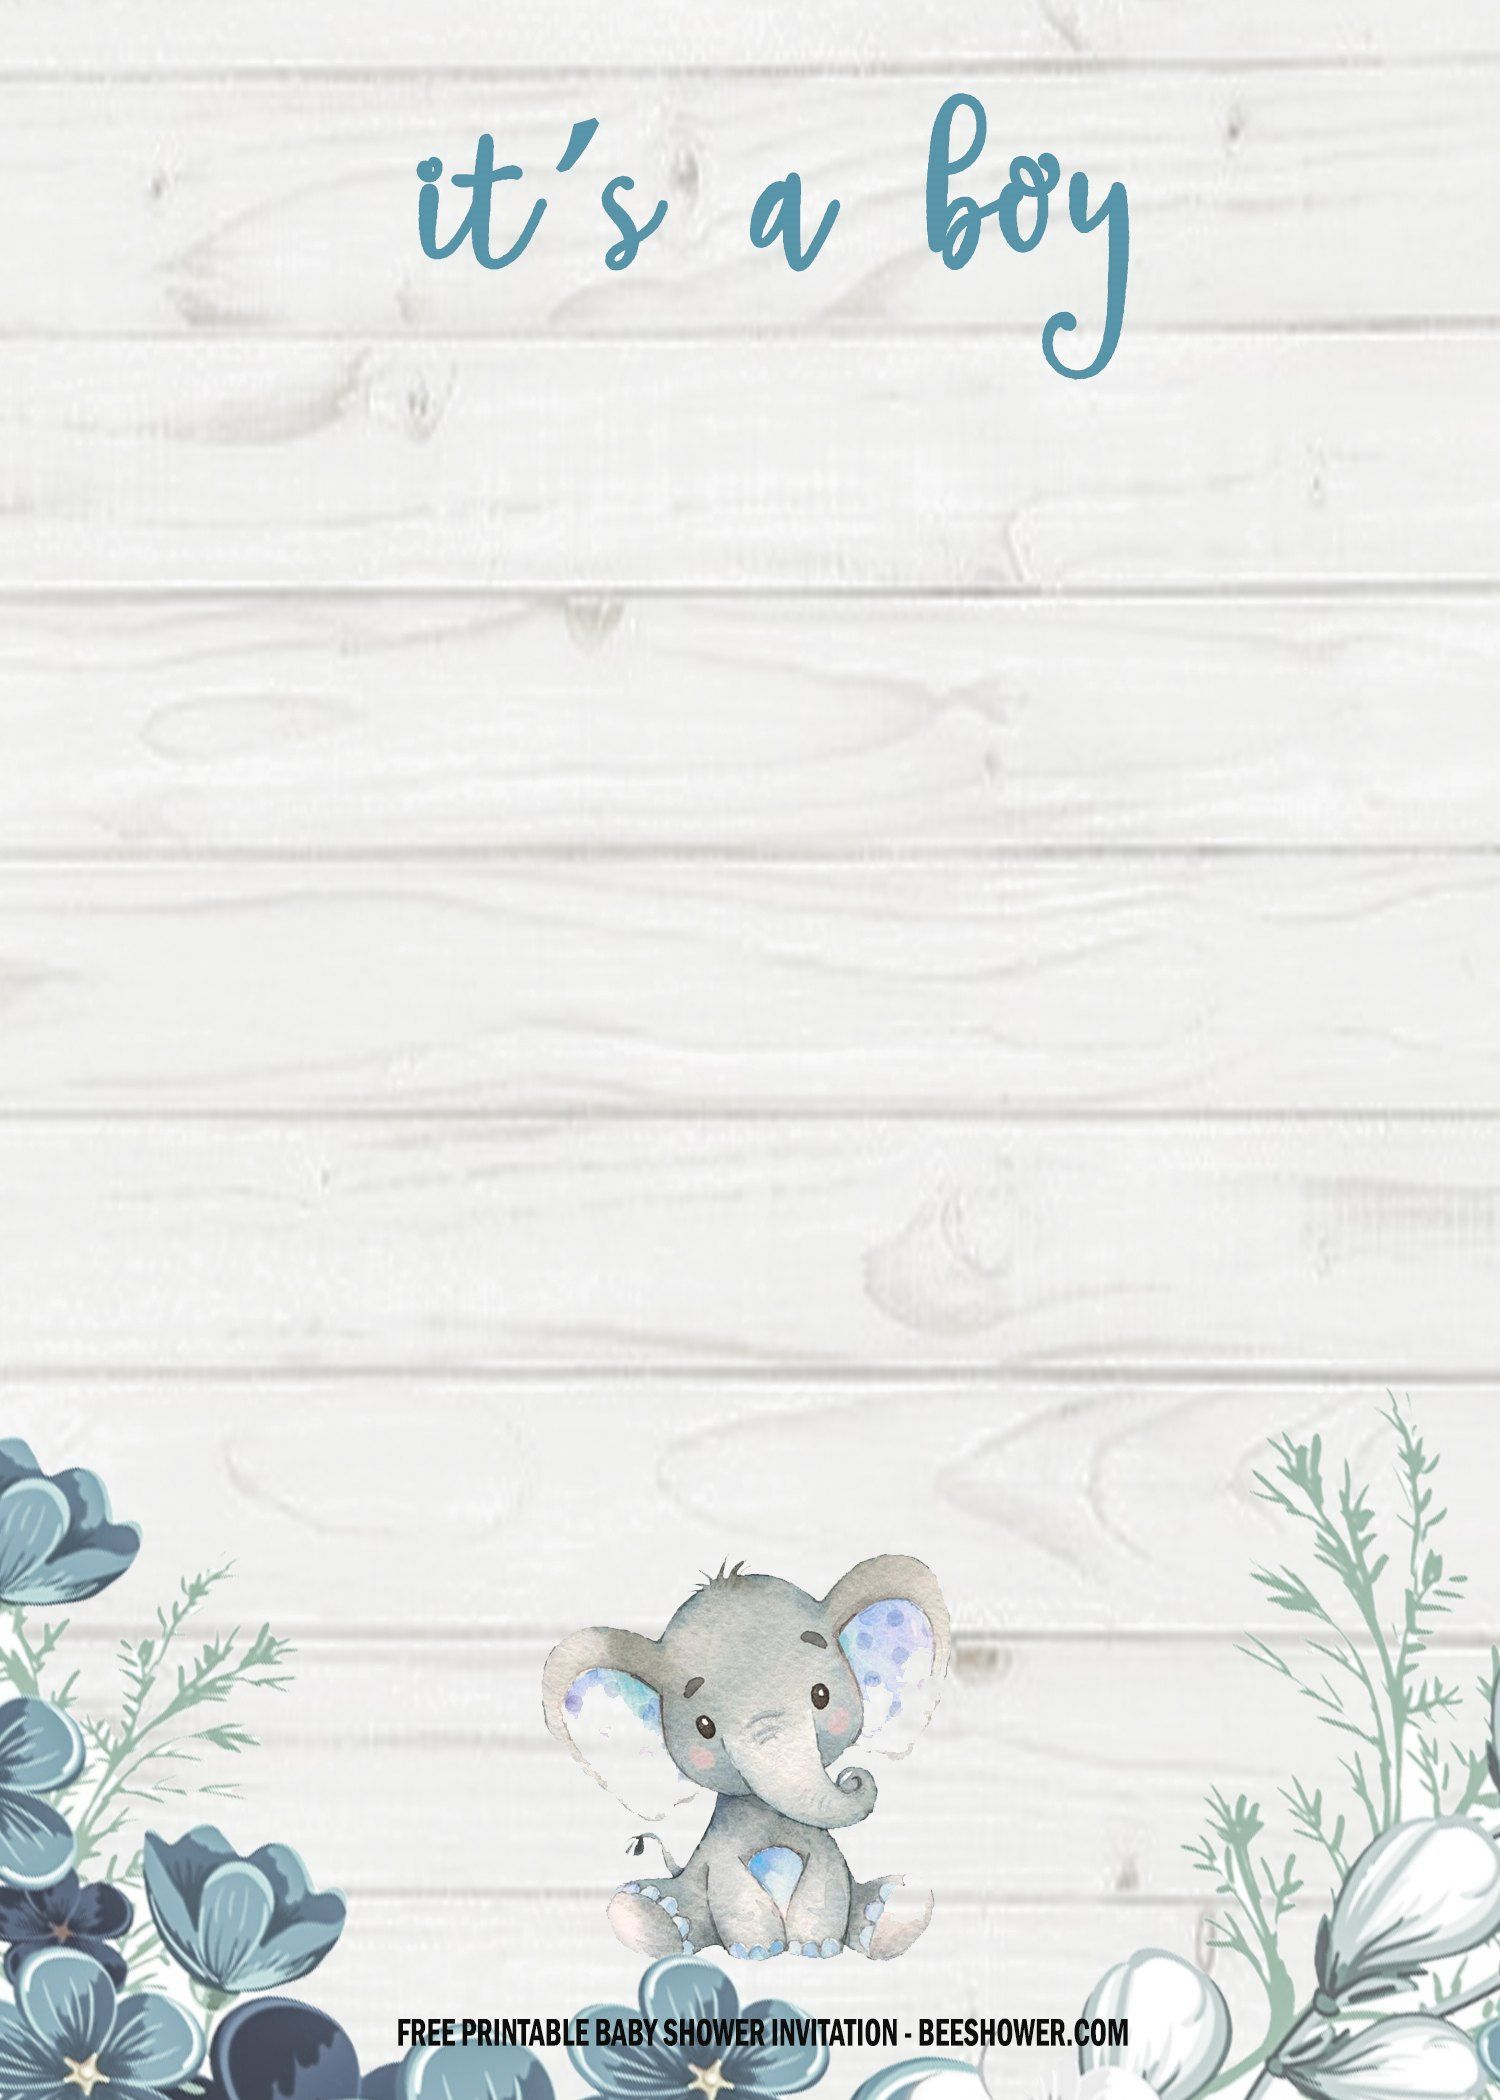 007 Phenomenal Free Printable Elephant Baby Shower Invitation Template Highest Clarity  Templates EditableFull